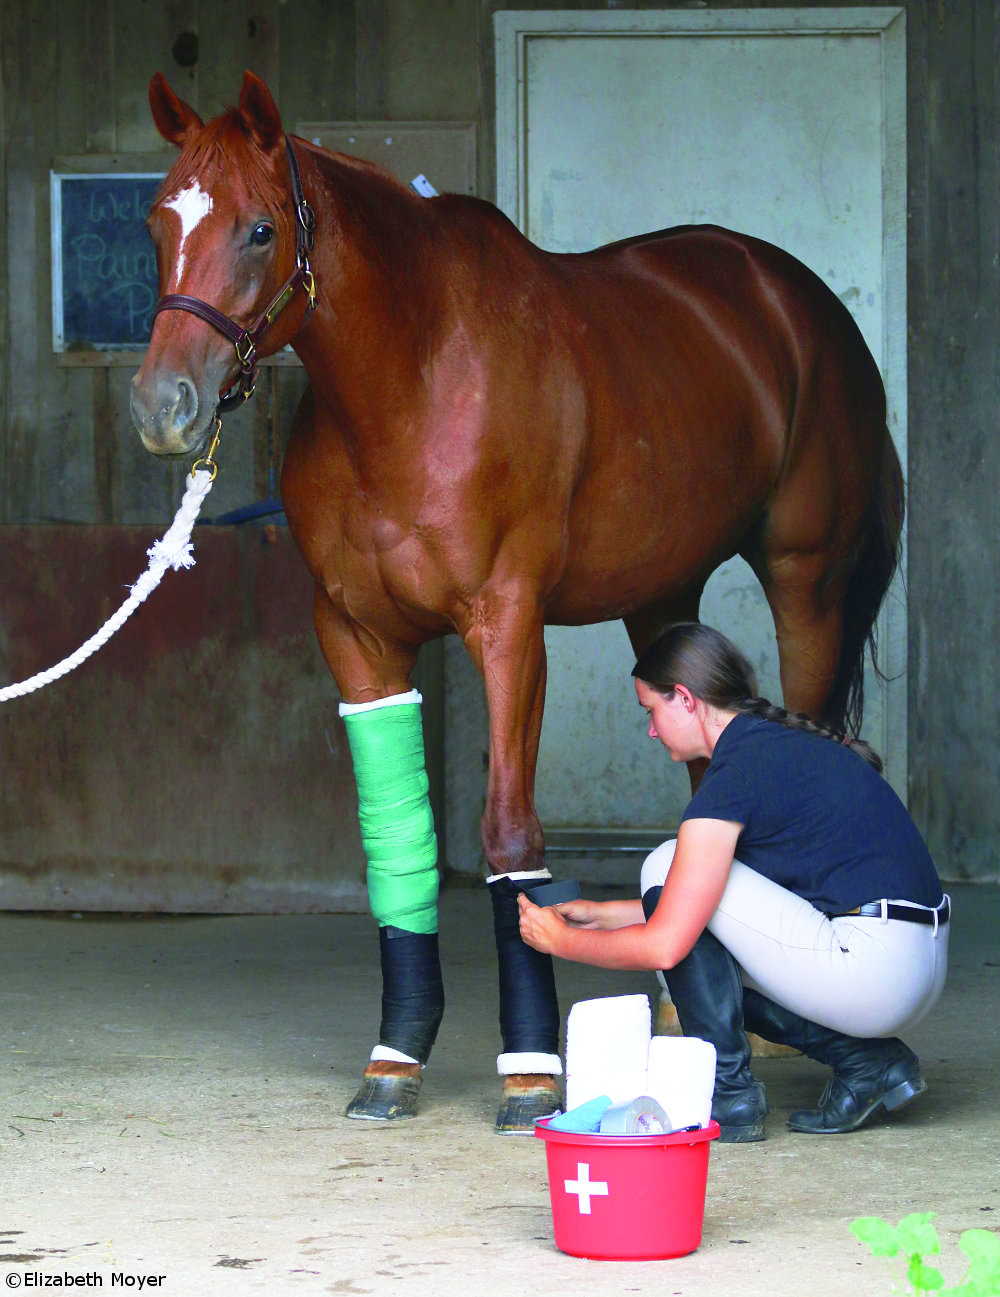 Bandaging a horse's legs